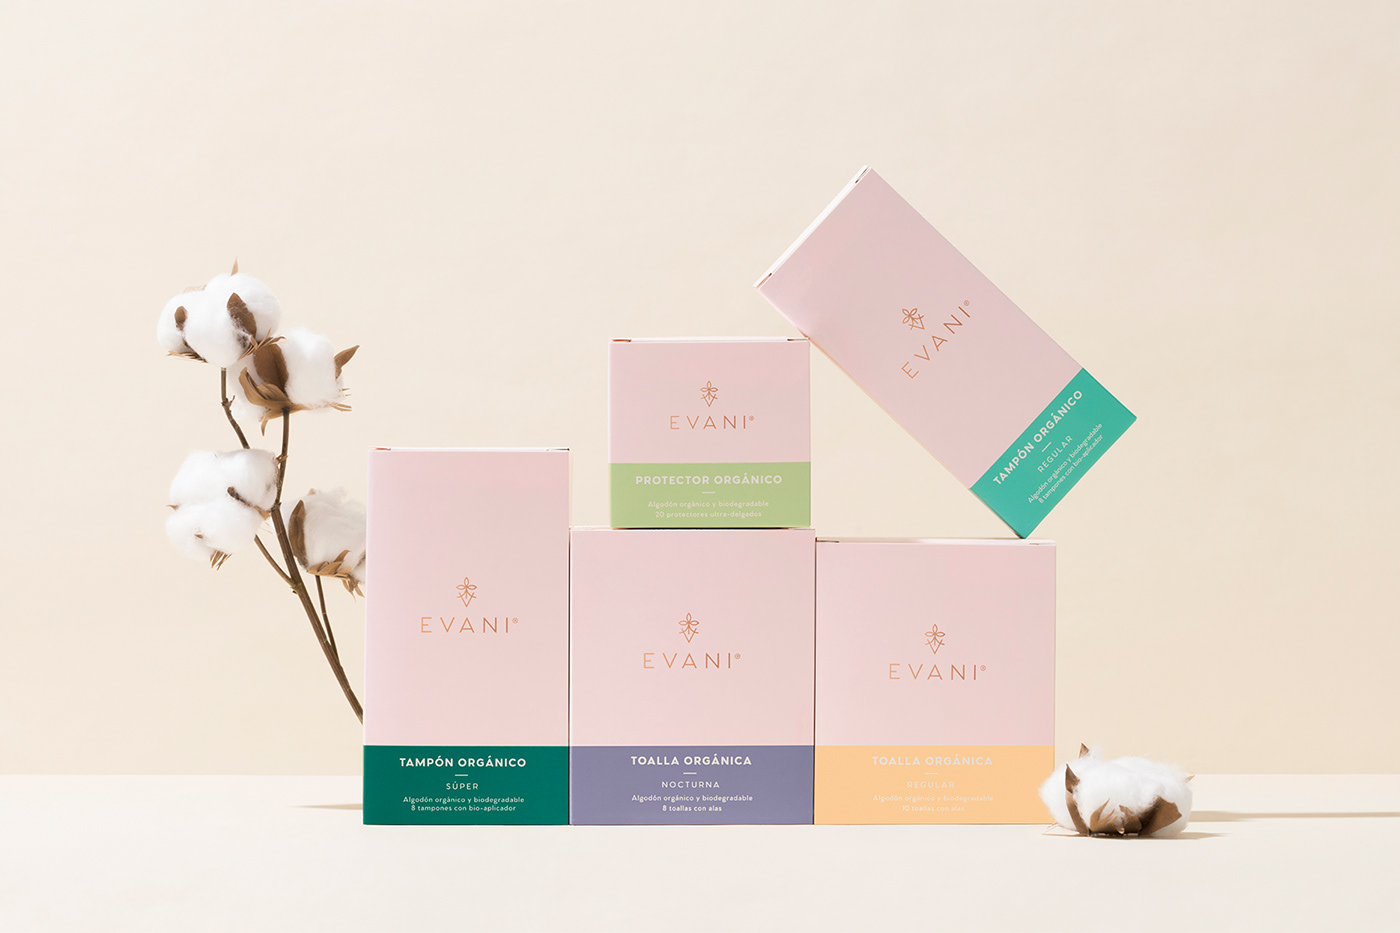 branding  cotton design femenine organic Packaging pads product Sustainable tampons